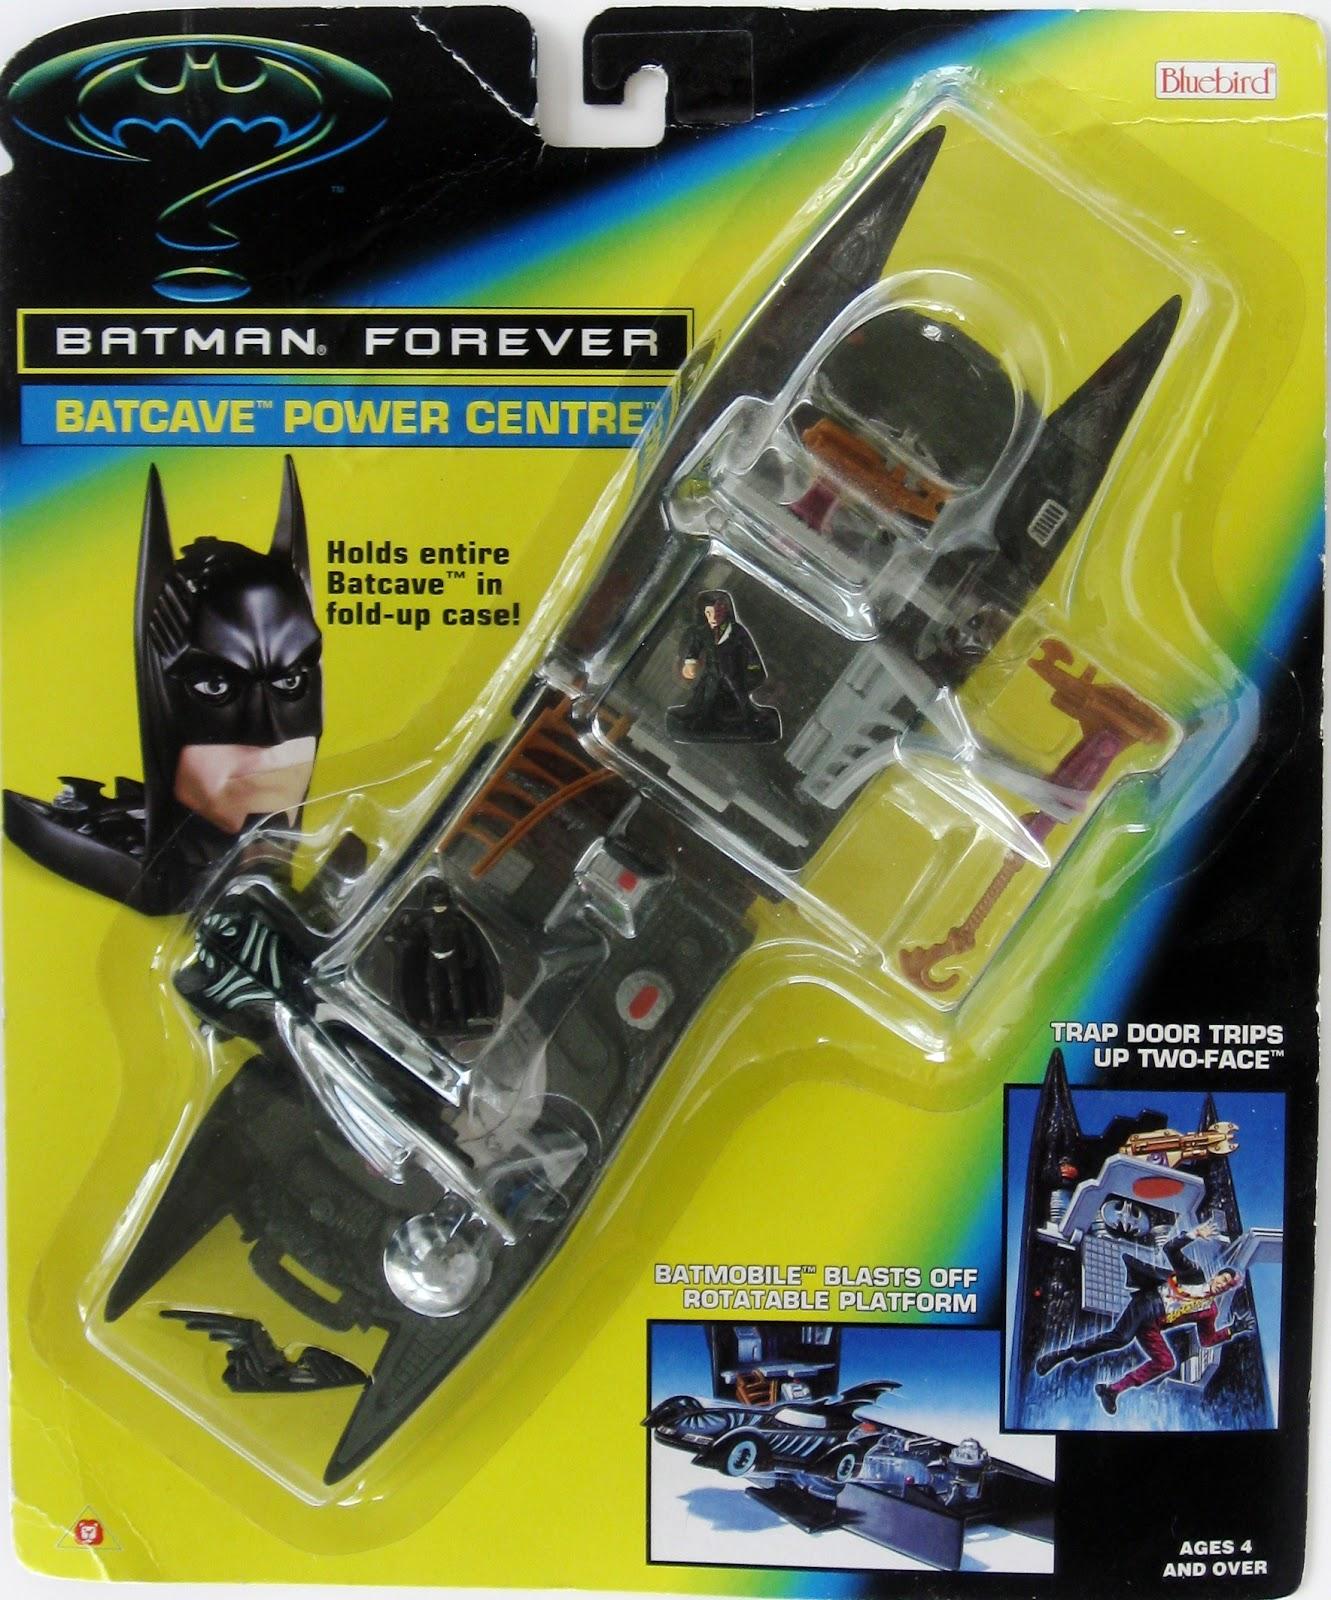 batcavepowercentre.JPG